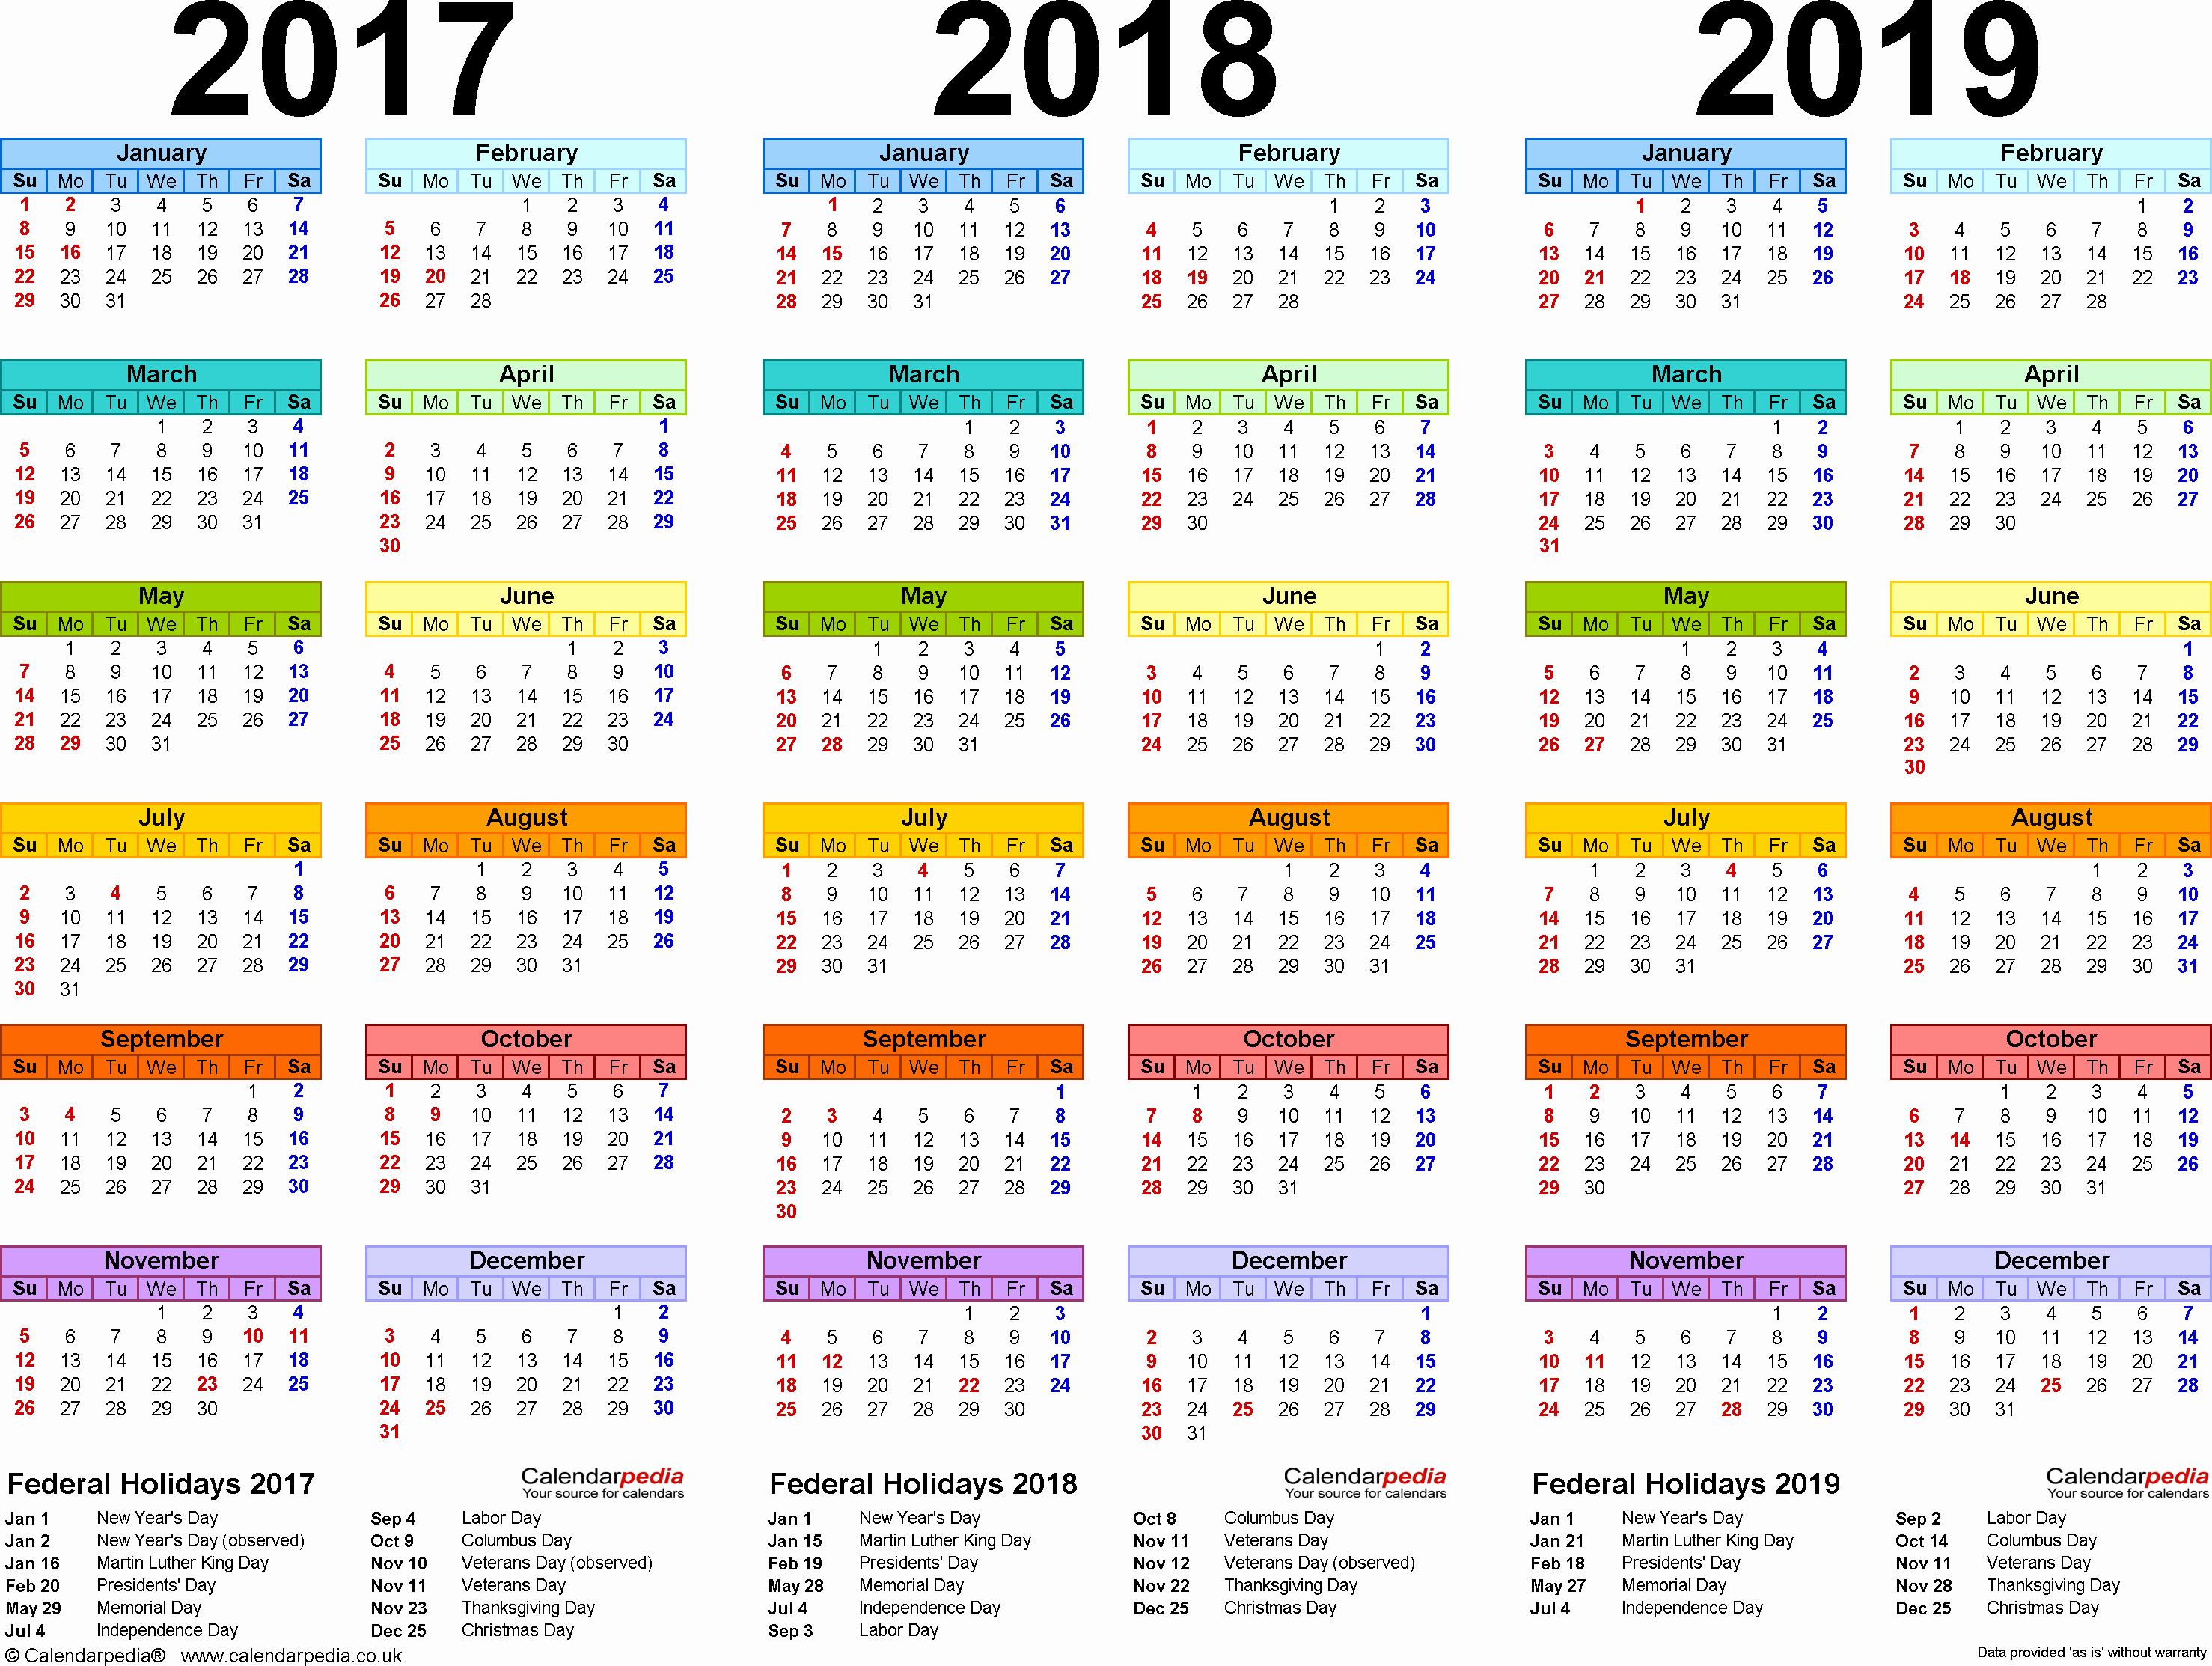 2017 Full Year Calendar Template Best Of 2017 2018 2019 Calendar 4 Three Year Printable Pdf Calendars